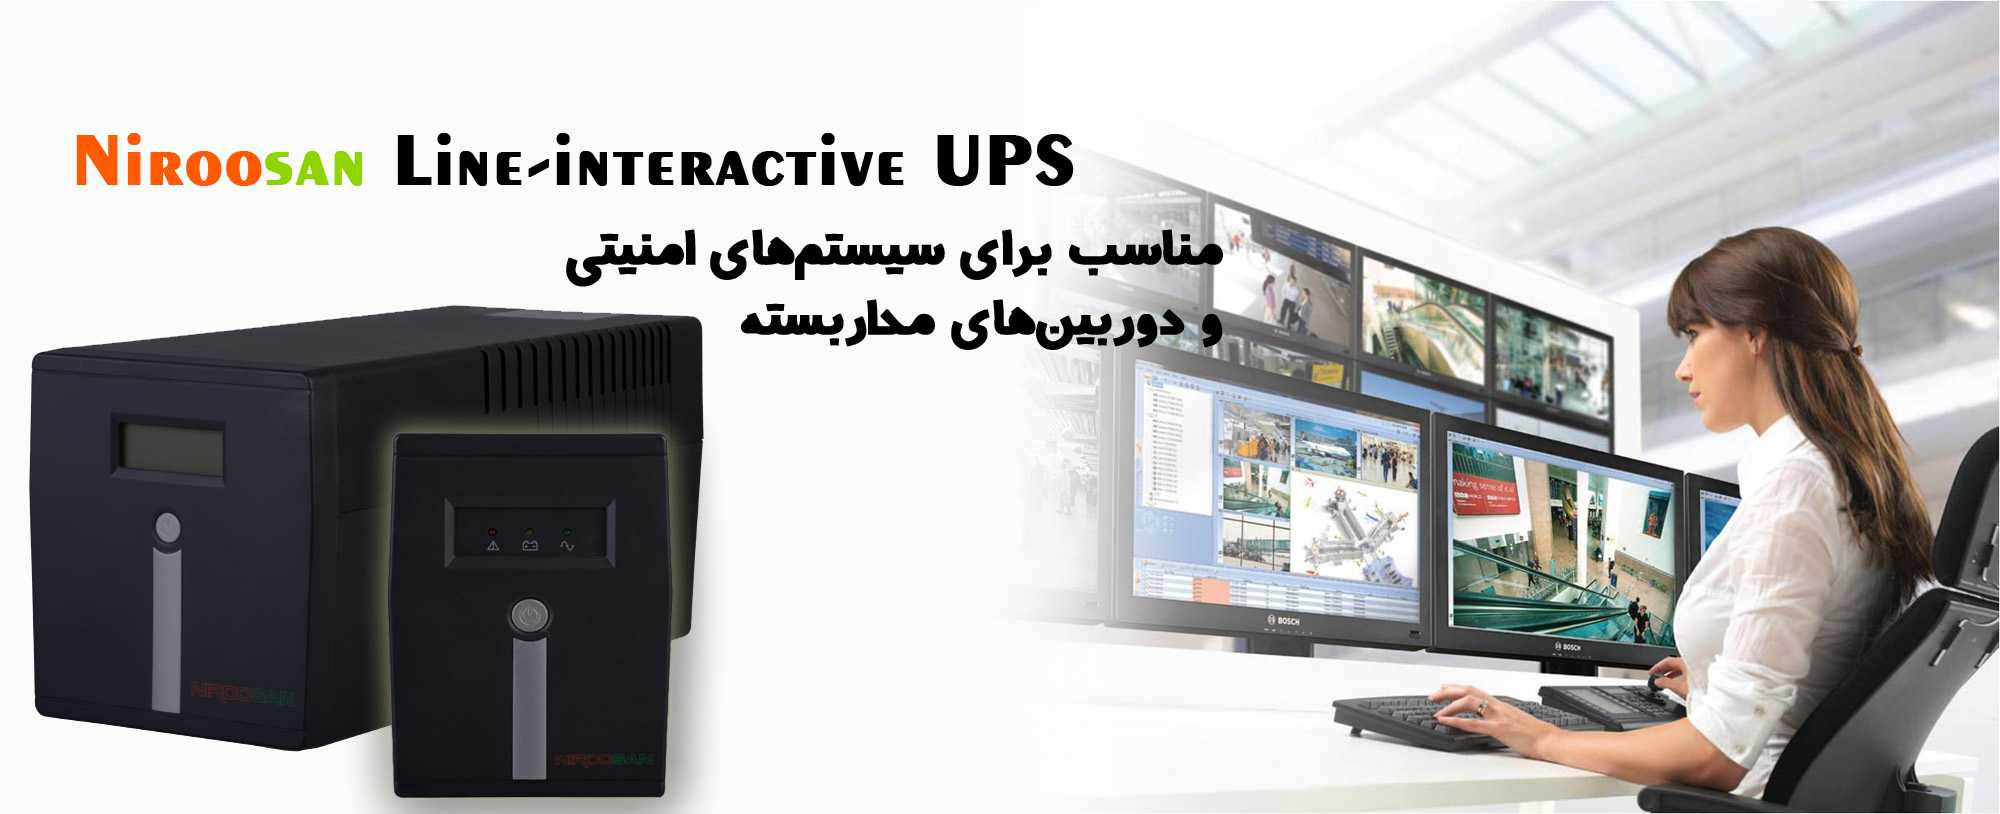 Niroosan Line-interactive UPS